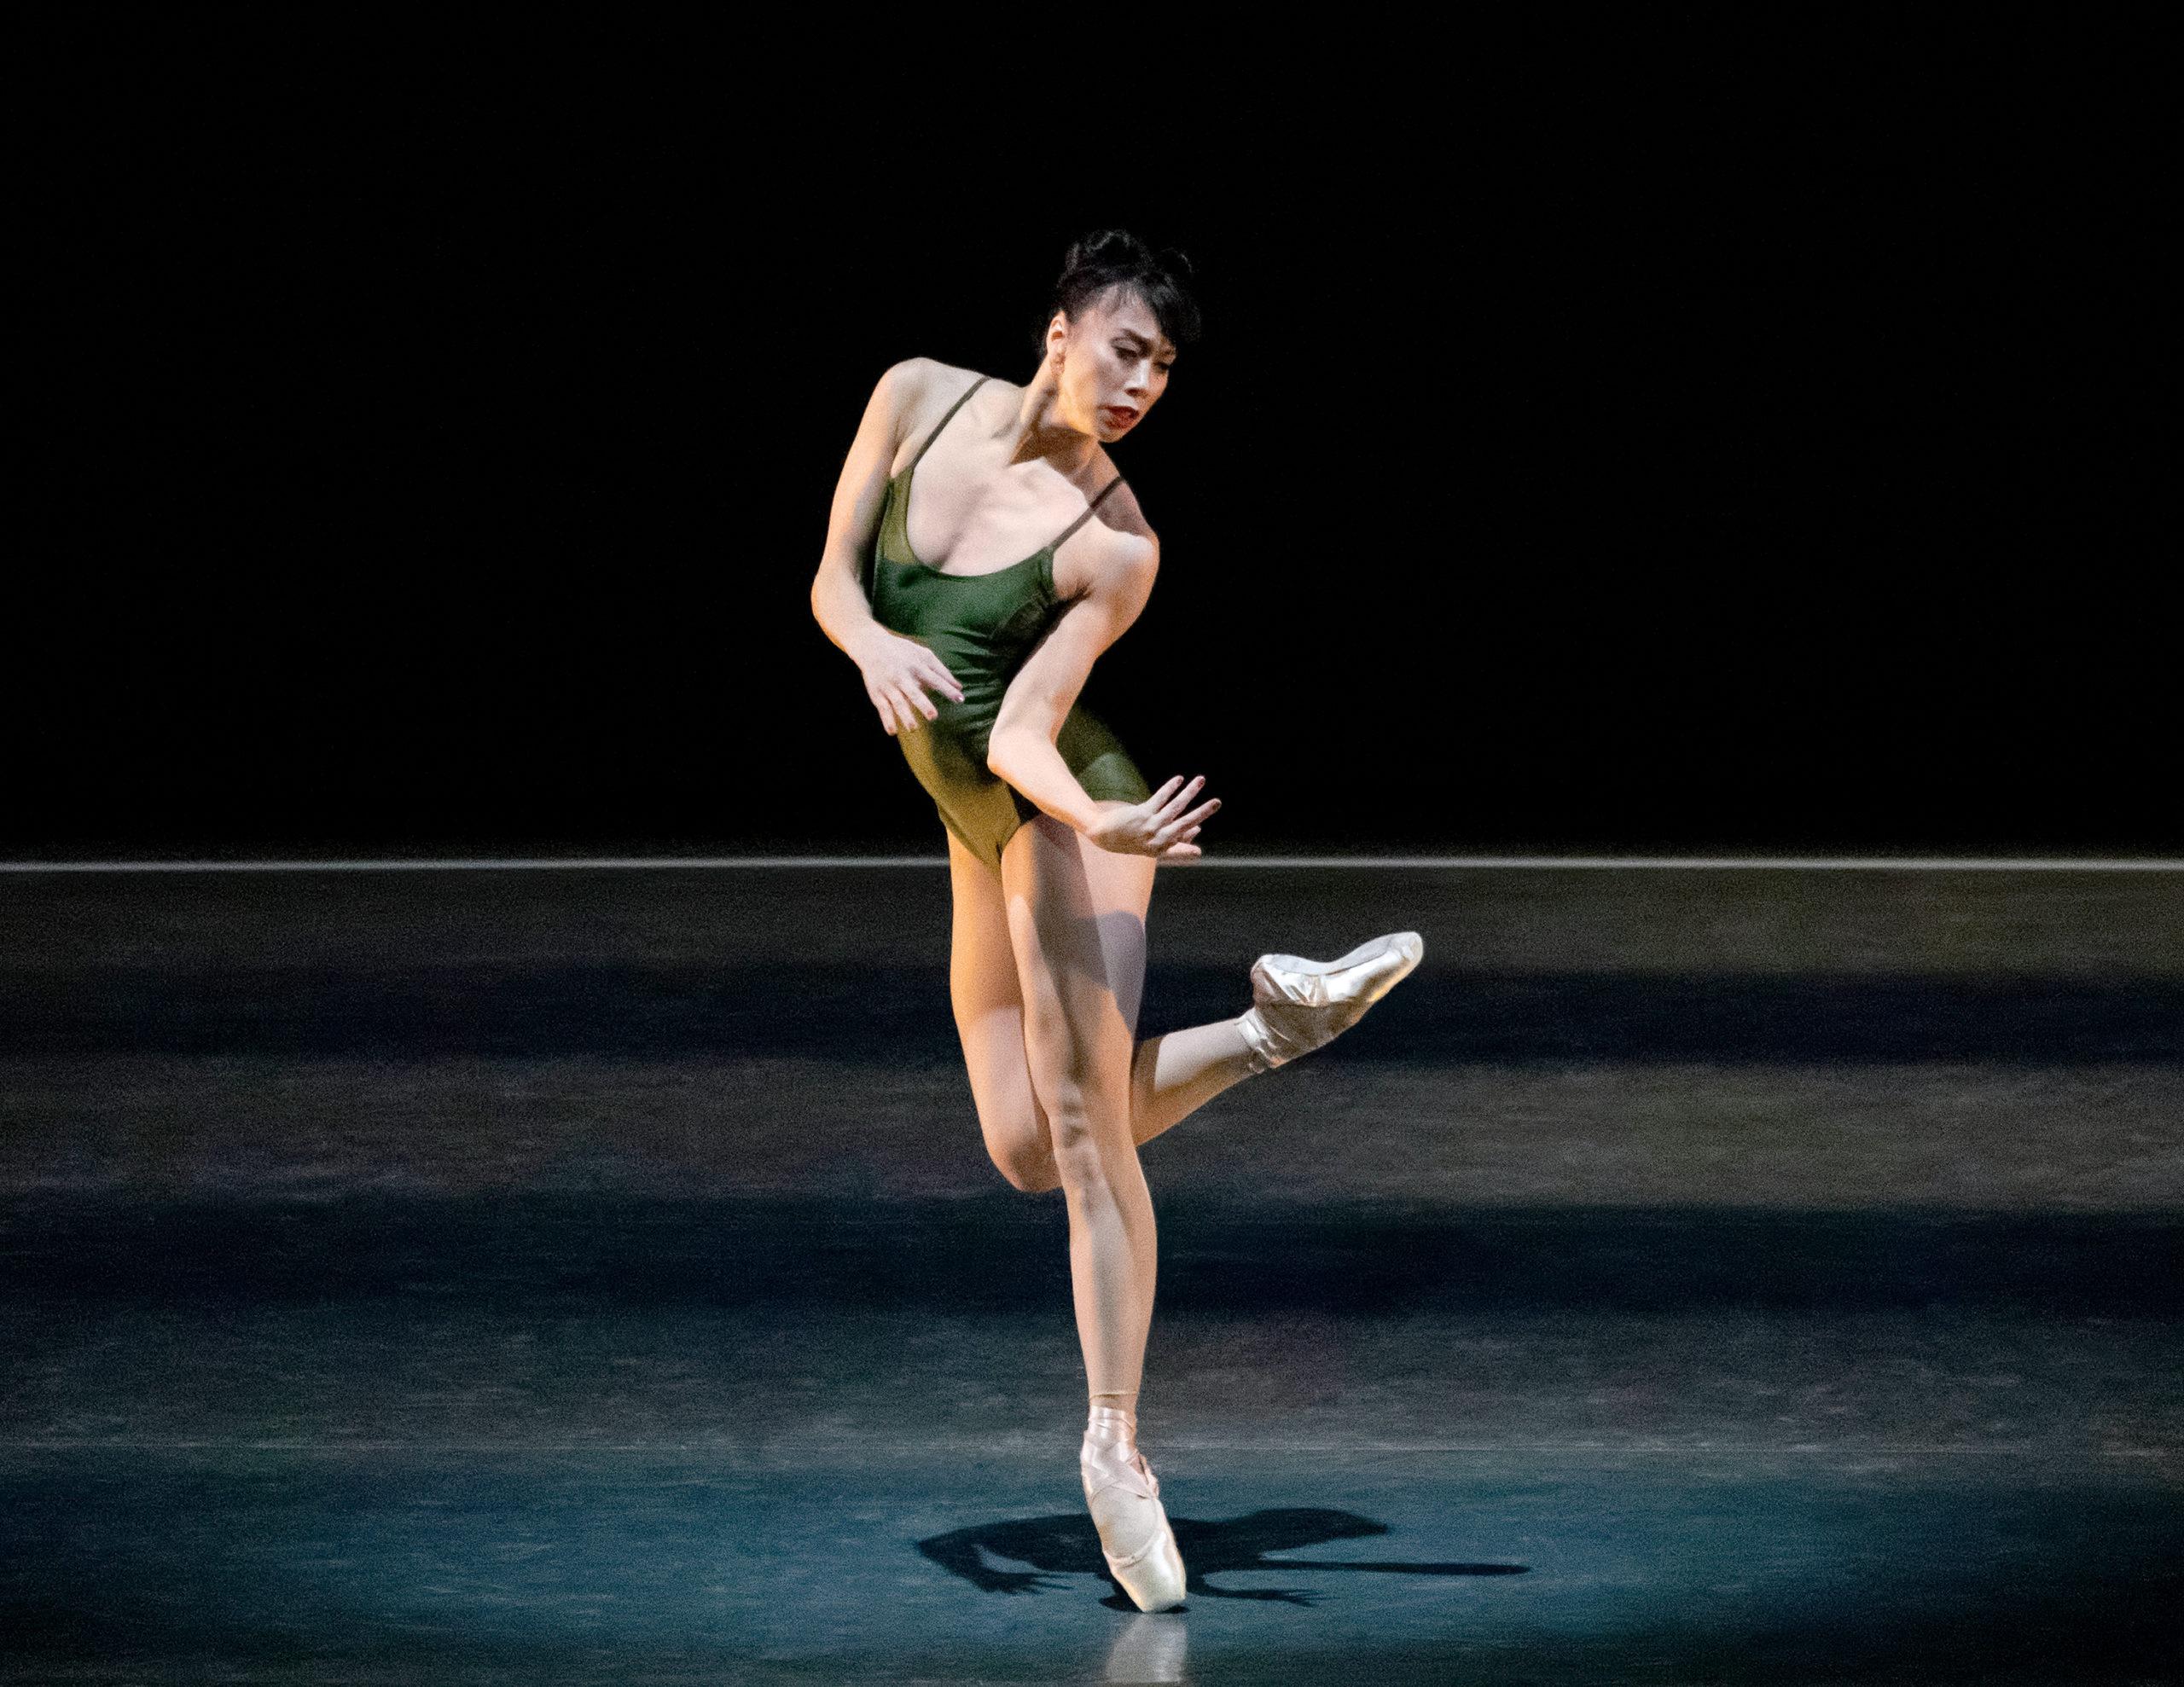 Georgina Pazcoguin, wearing a green leotard,